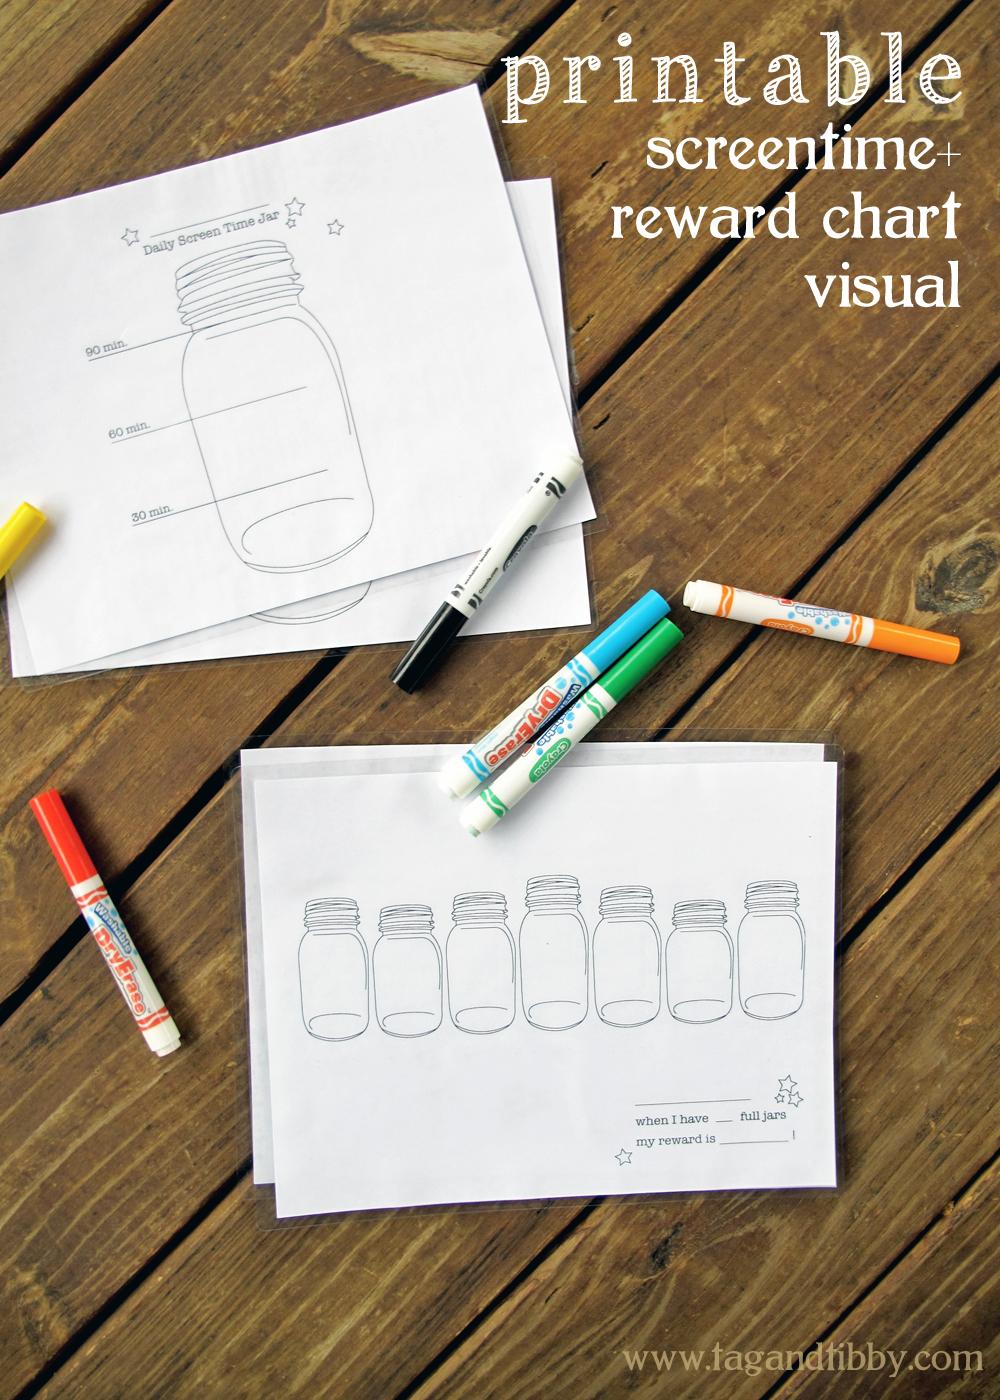 free printable! screen time and visual reward chart